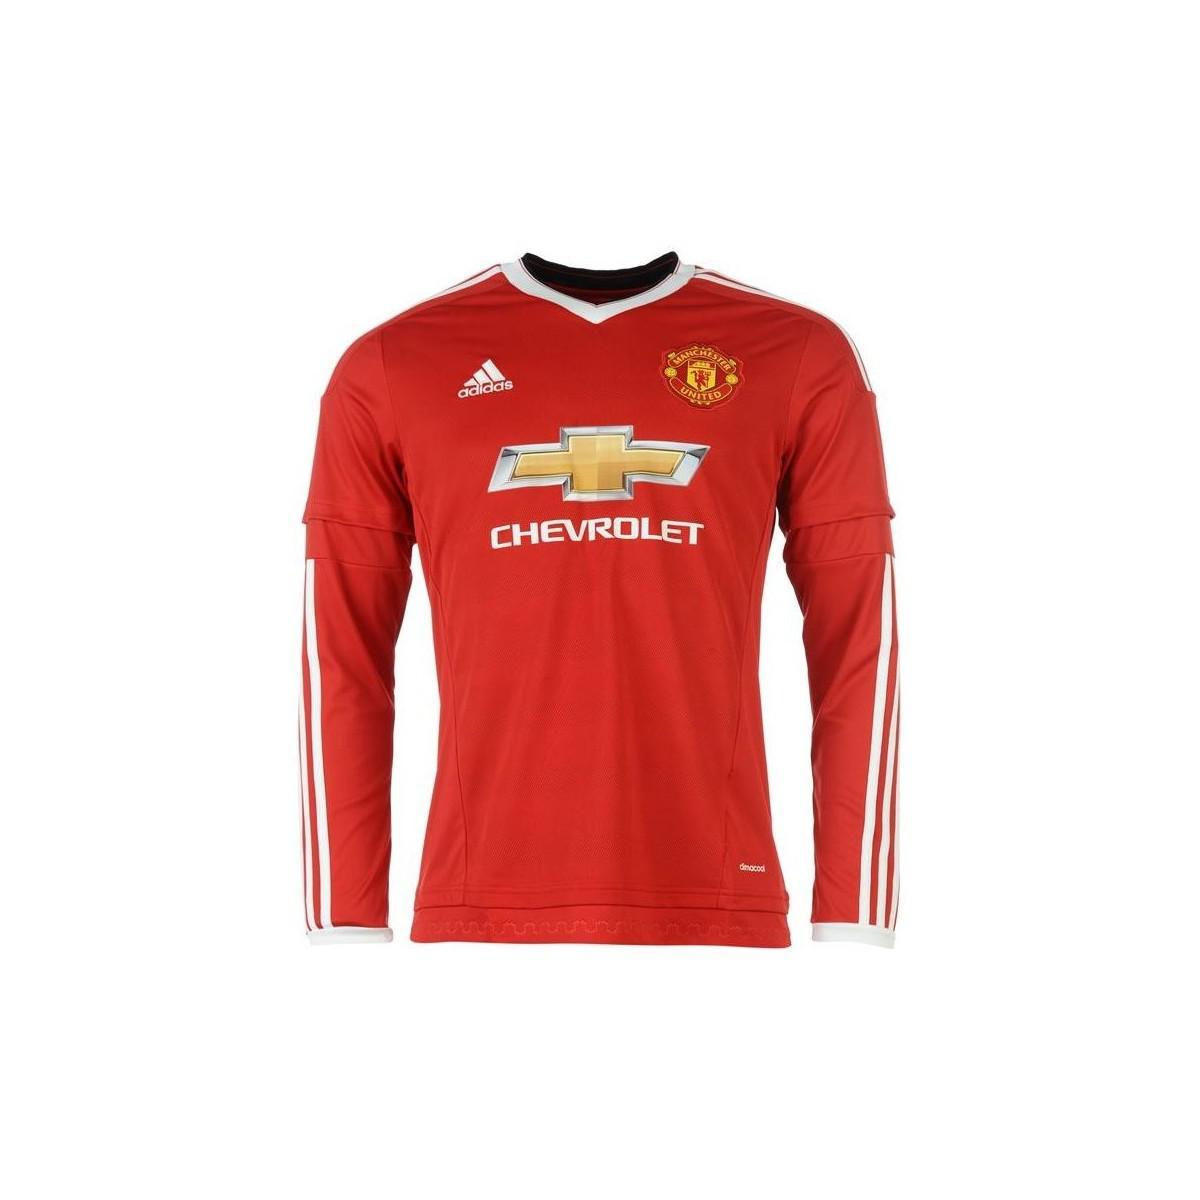 cheap for discount 97b4b f49c6 Manchester United Adidas Shirt 2016 | Azərbaycan Dillər ...